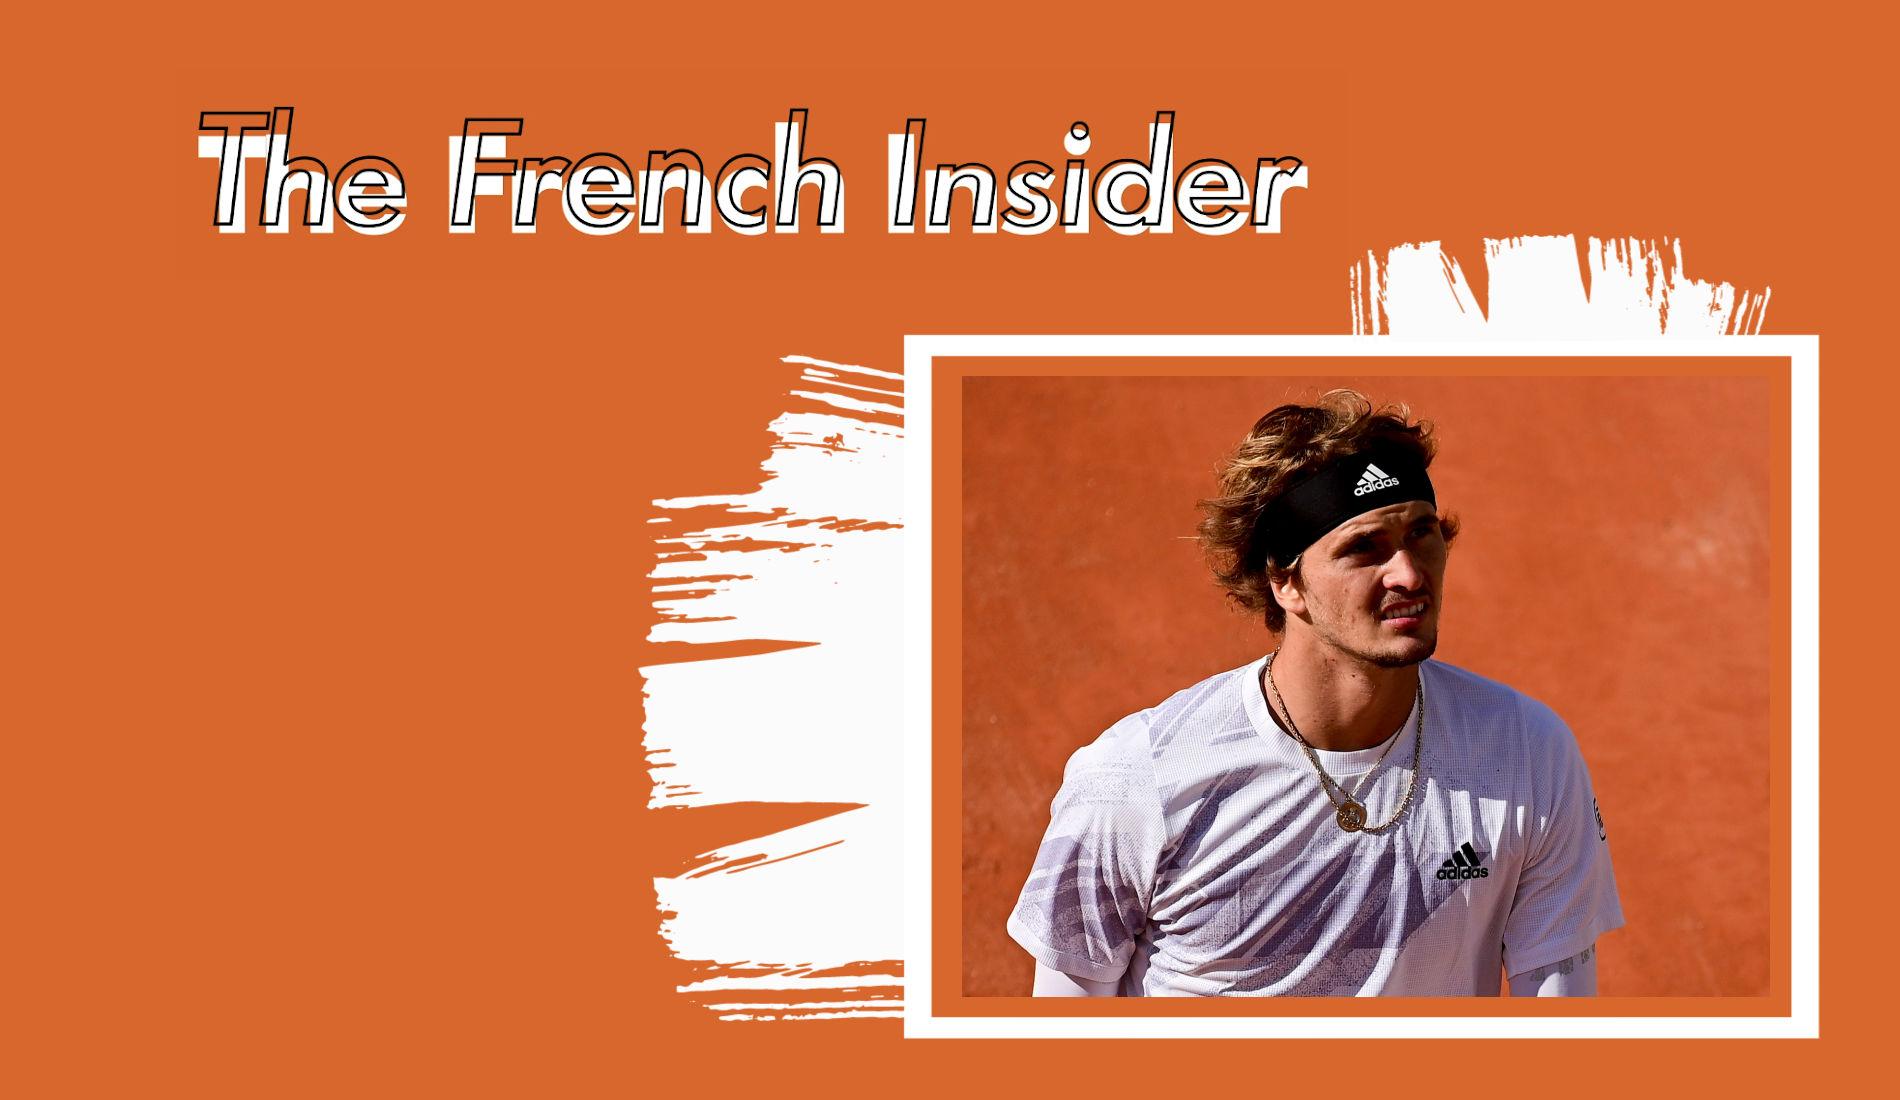 The French Insider #5 Zverev